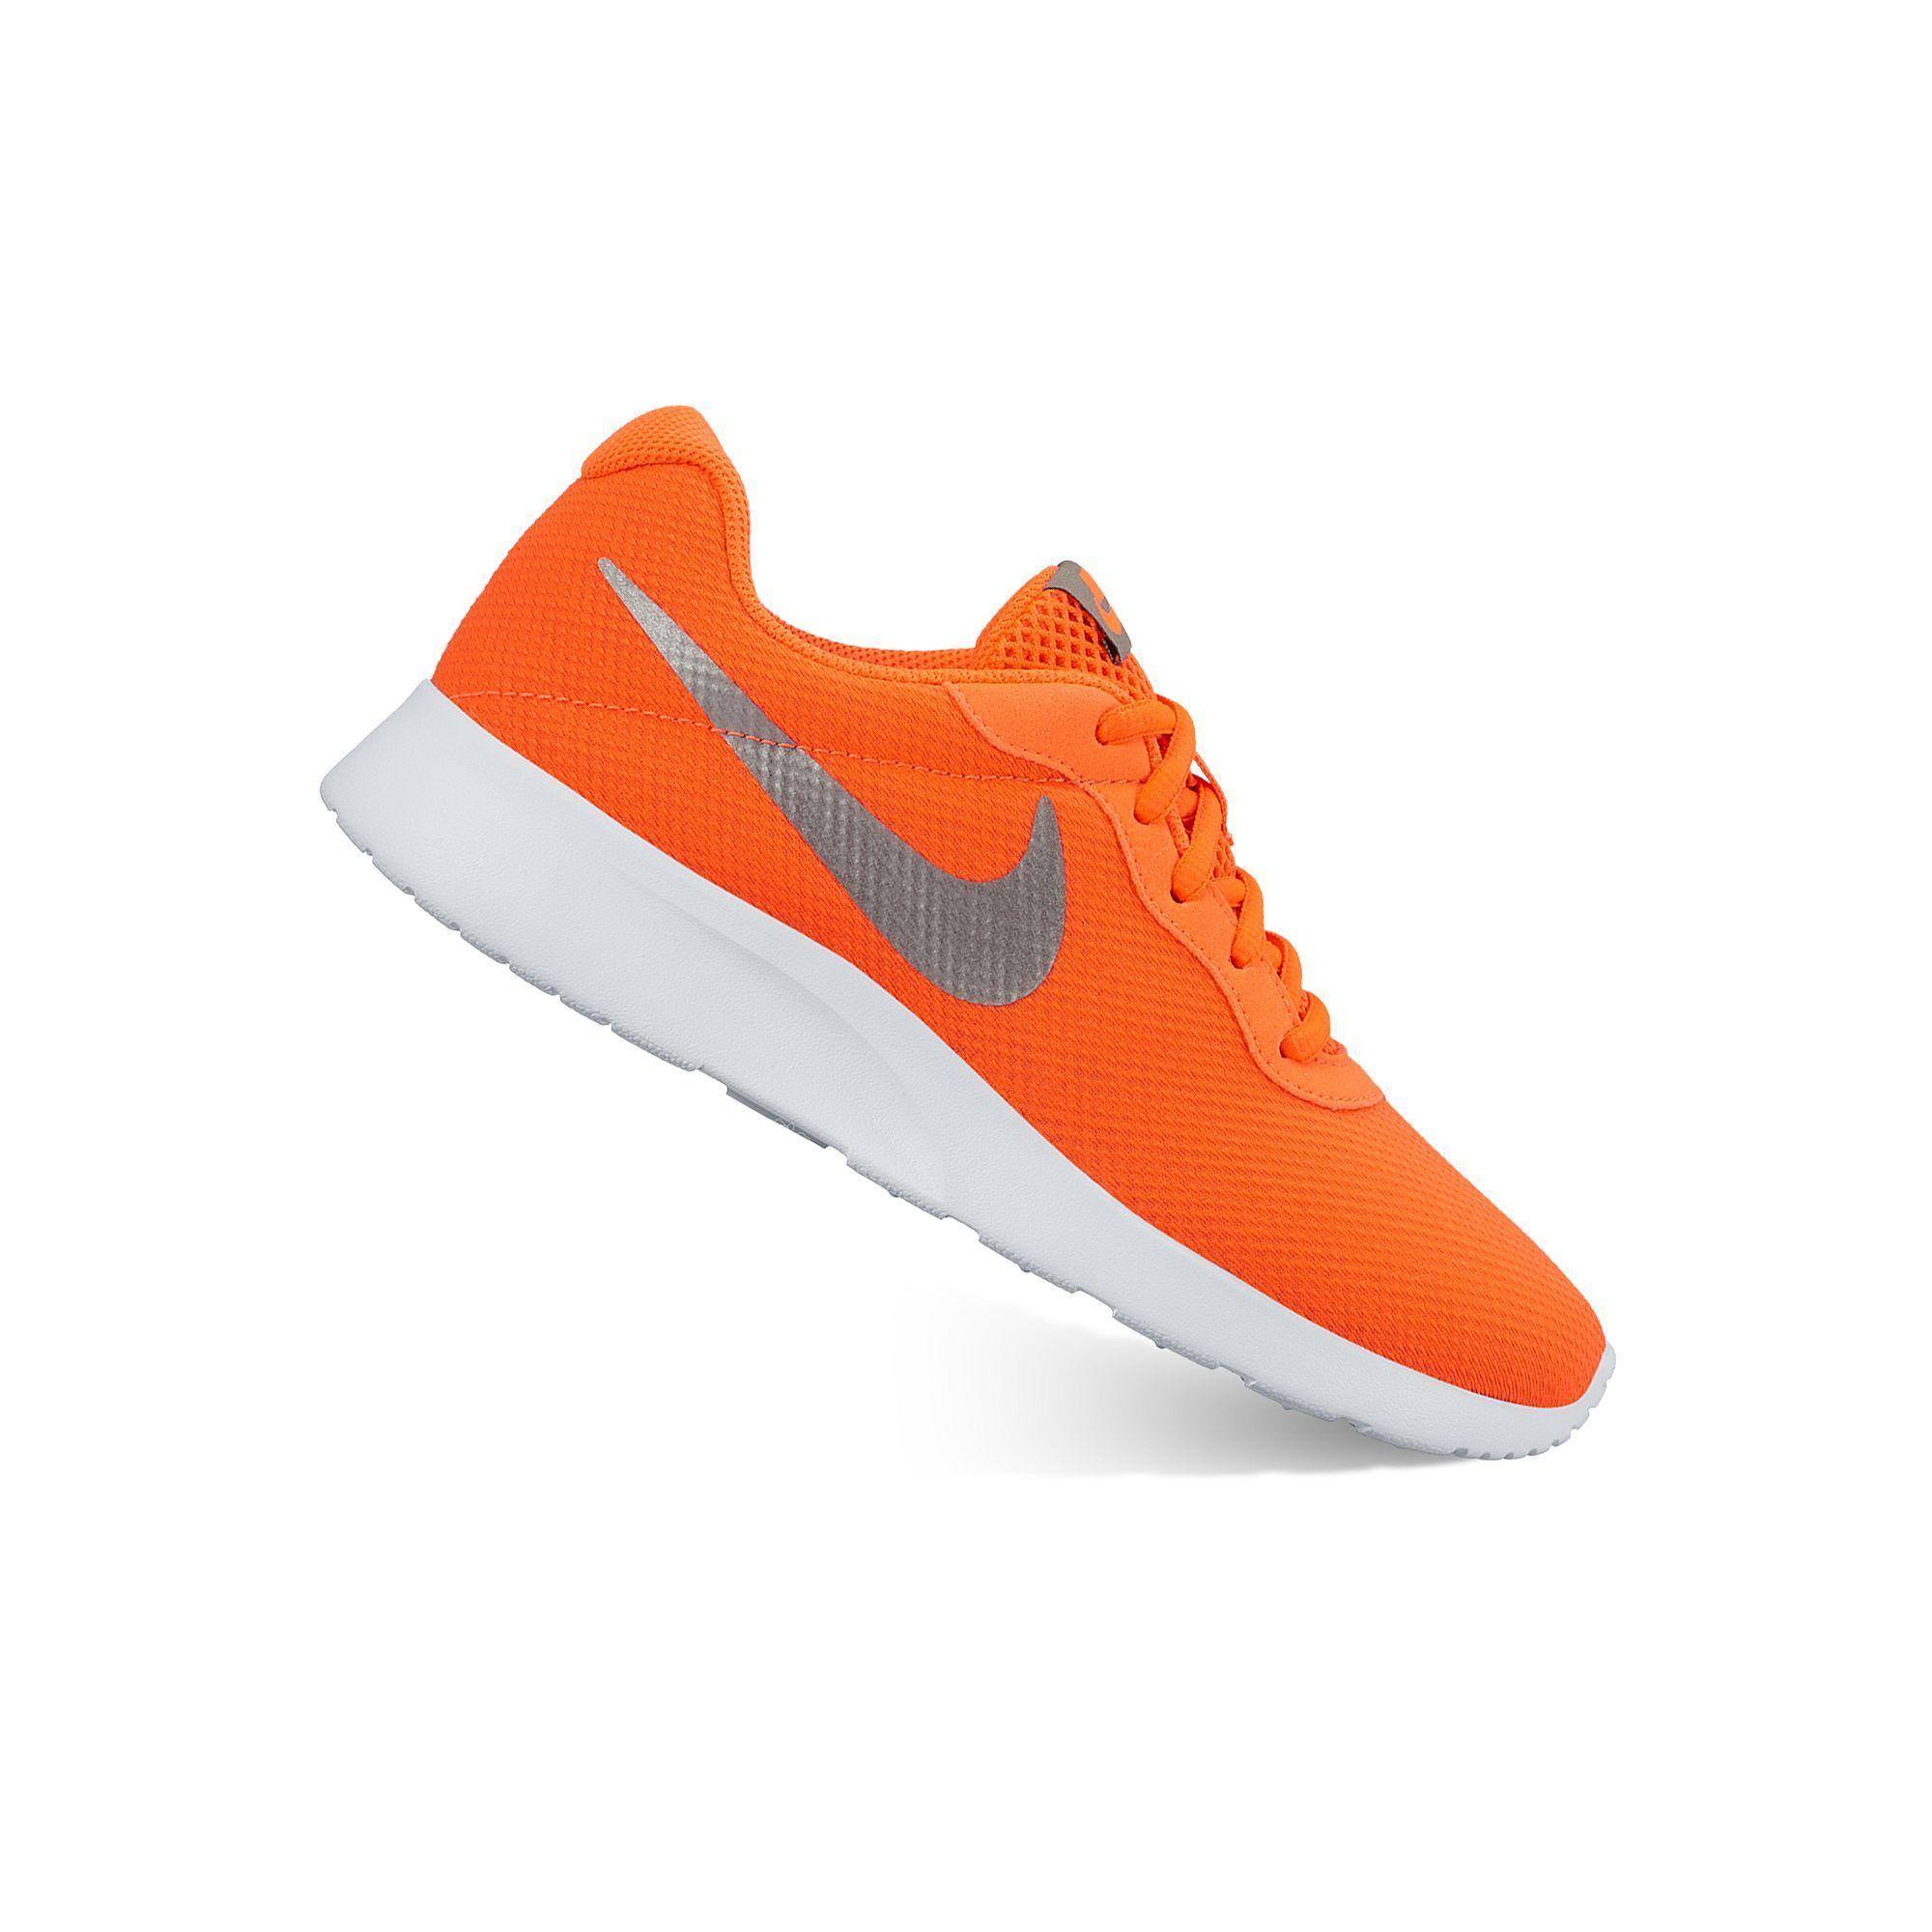 new style 09d9a 19c14 ... australia nike tanjun womens athletic shoes size 6.5 drk orange 4b25f  c6dd1